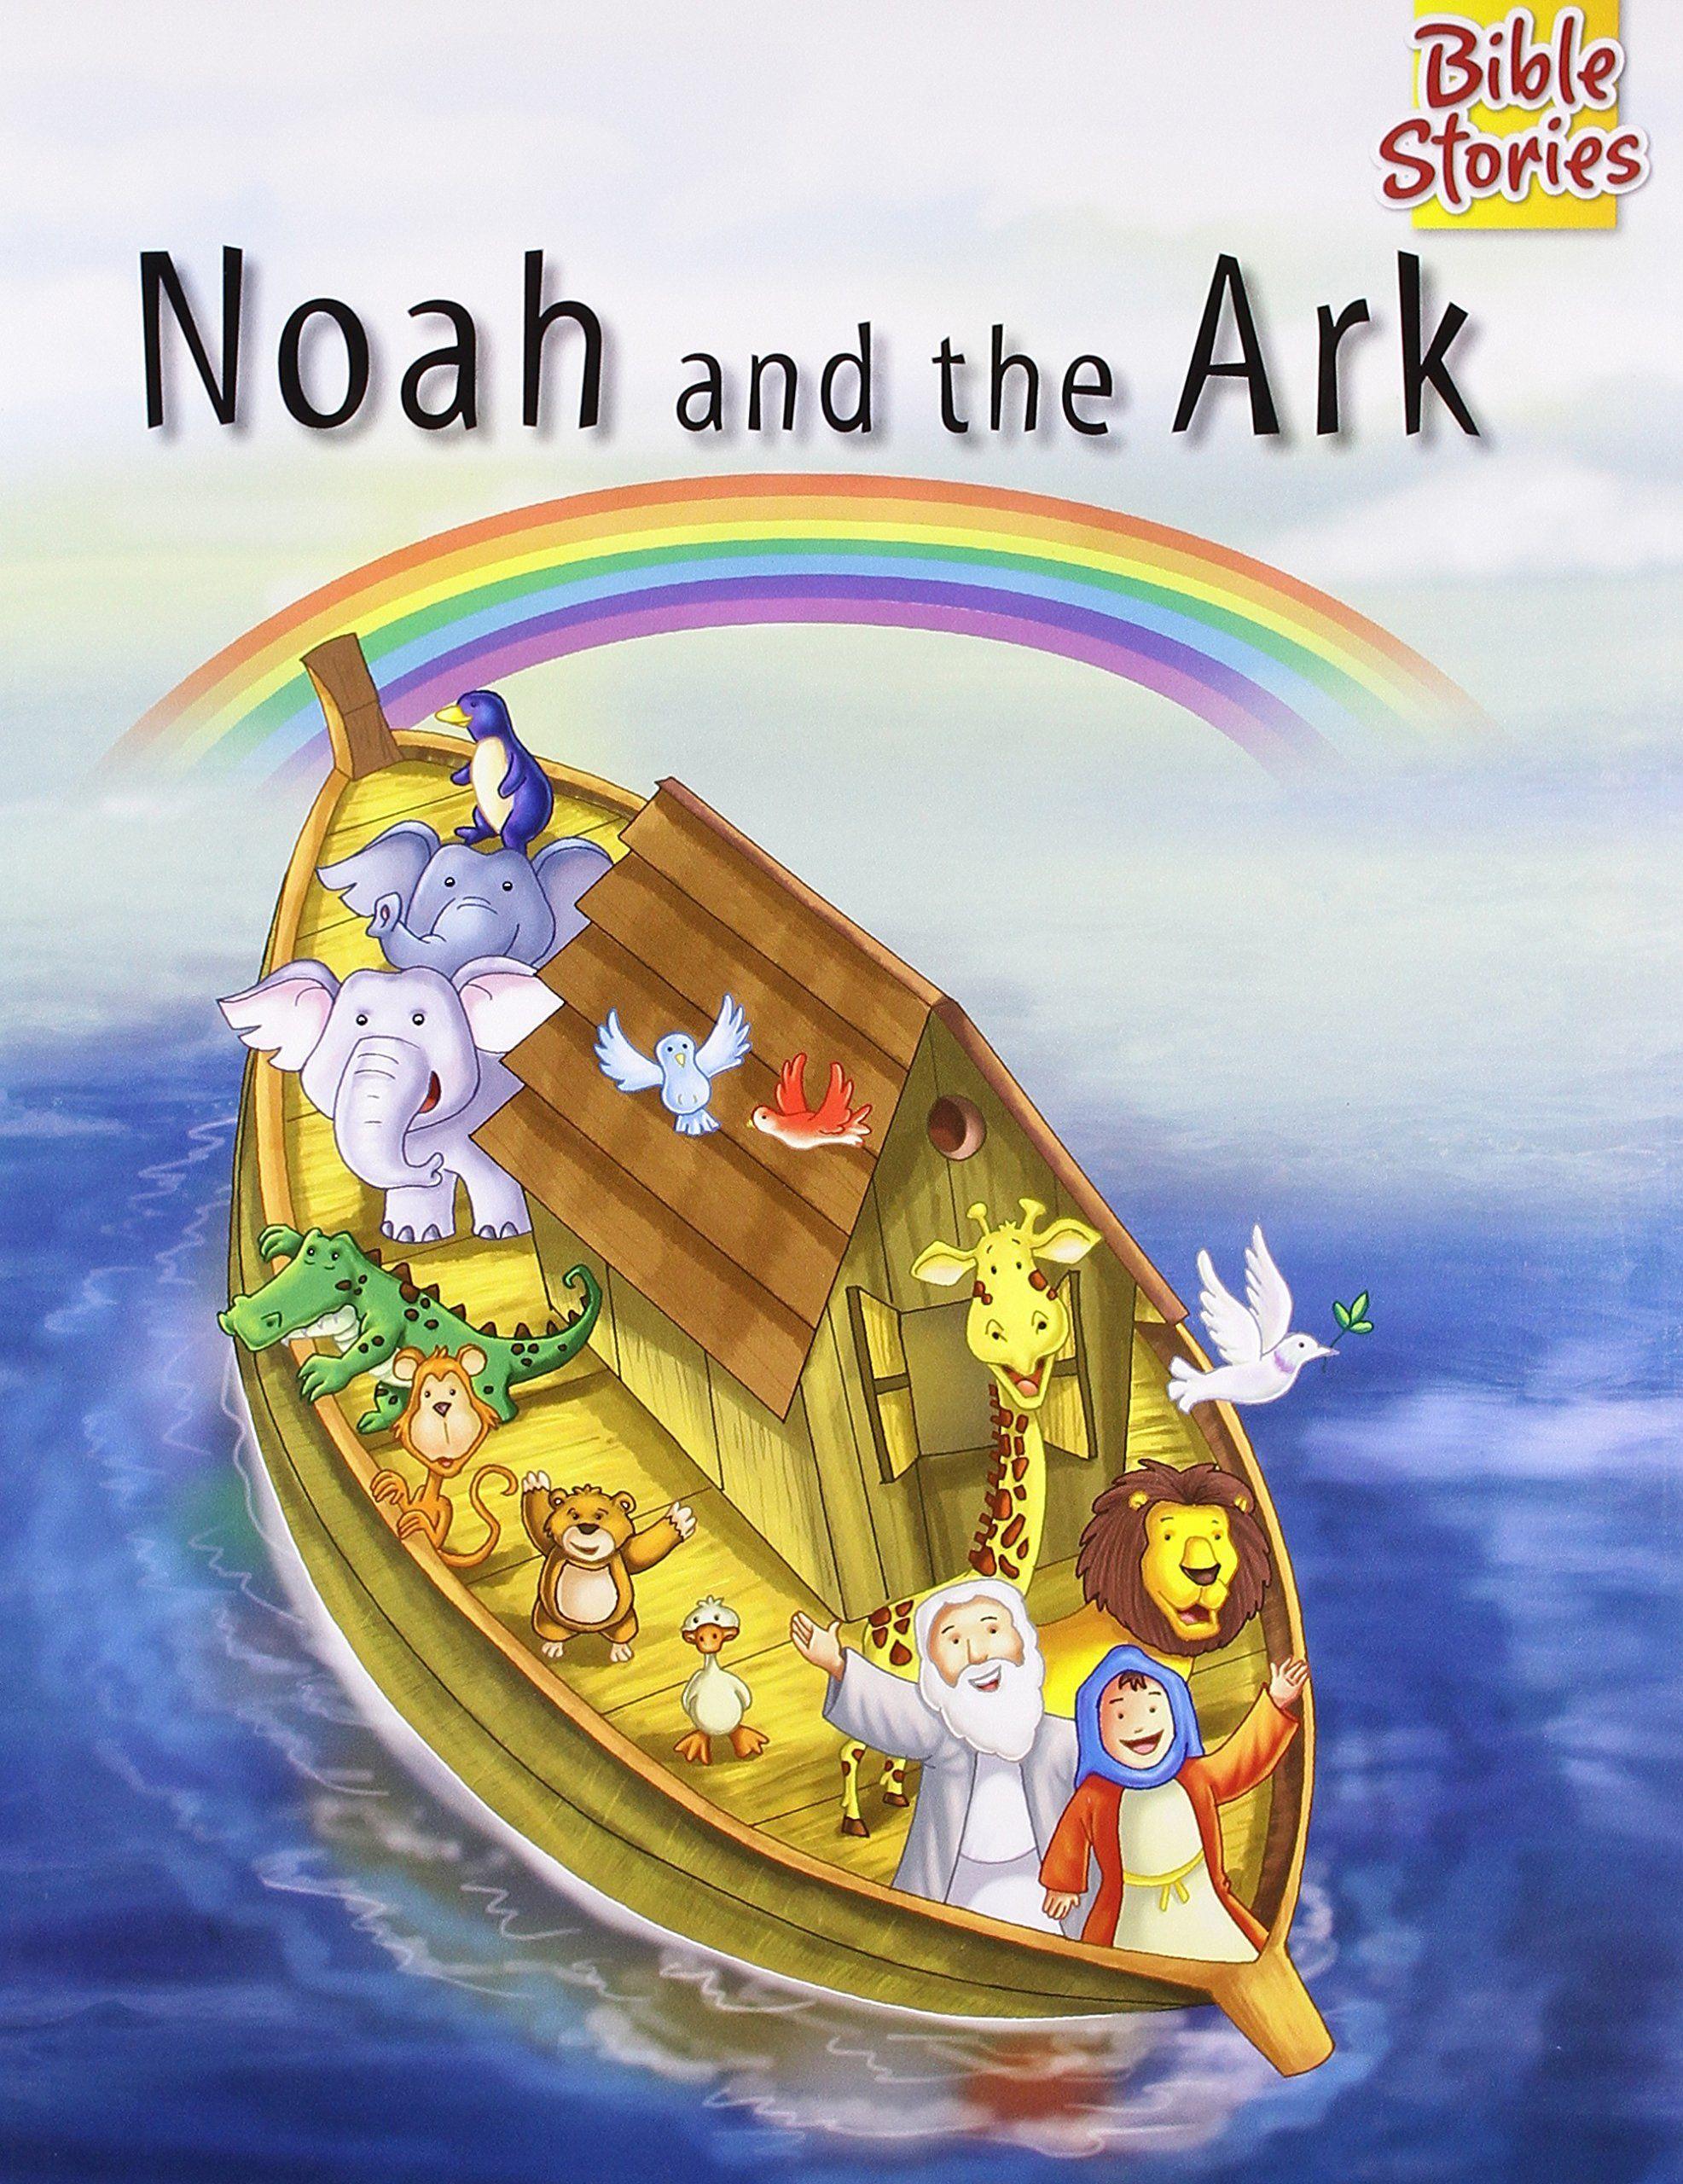 Noah & the Ark (Bible Stories Series) Amazon.co.uk